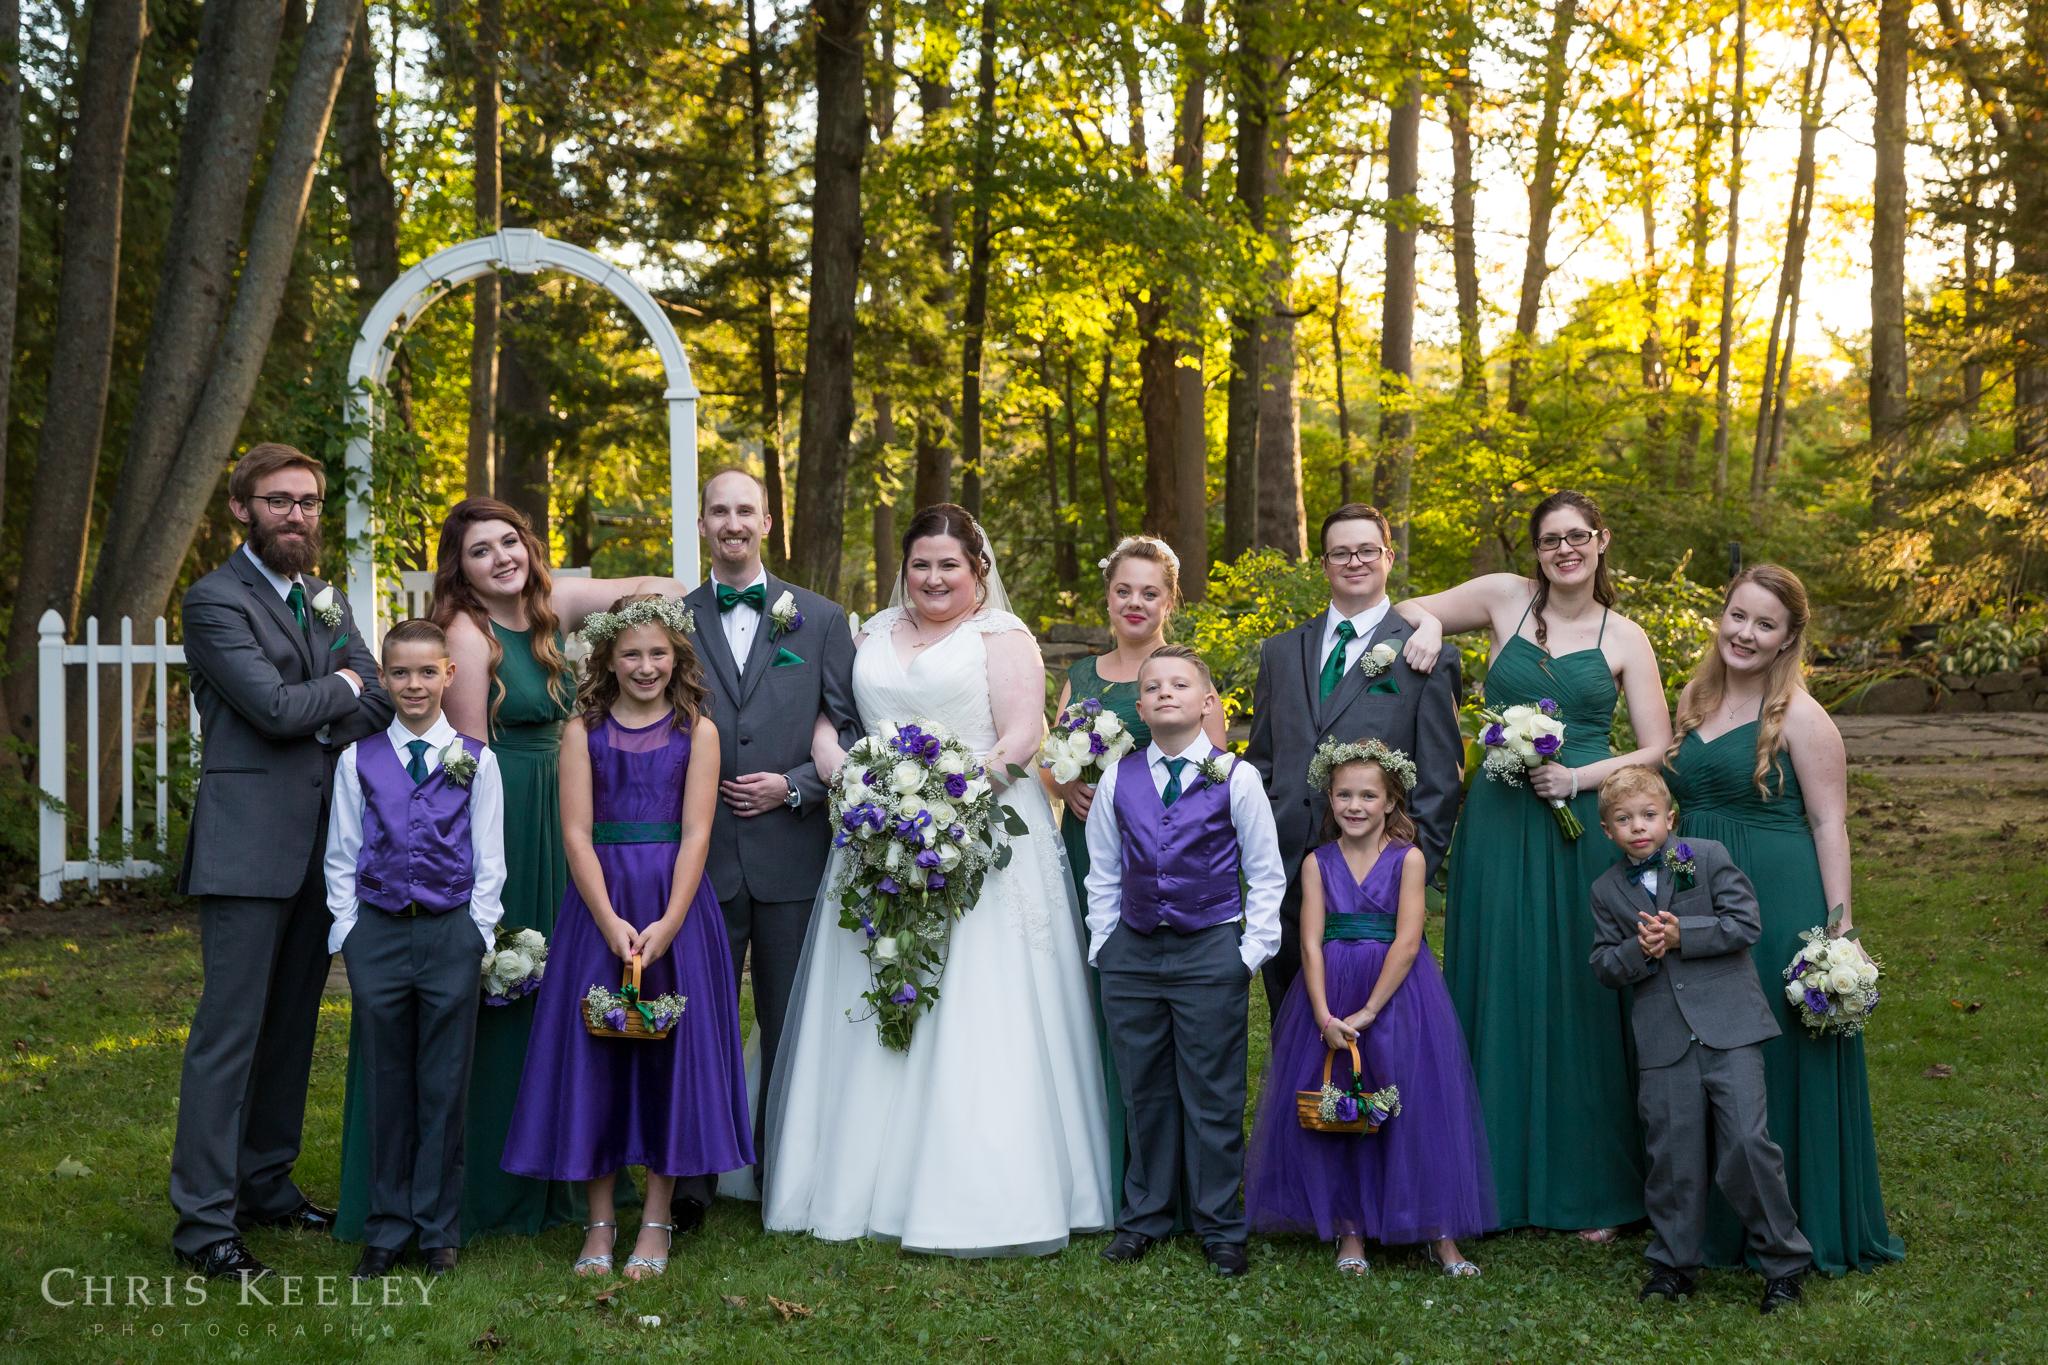 new-hampshire-wedding-photographer-three-chimneys-inn-chris-keeley-photography-22.jpg